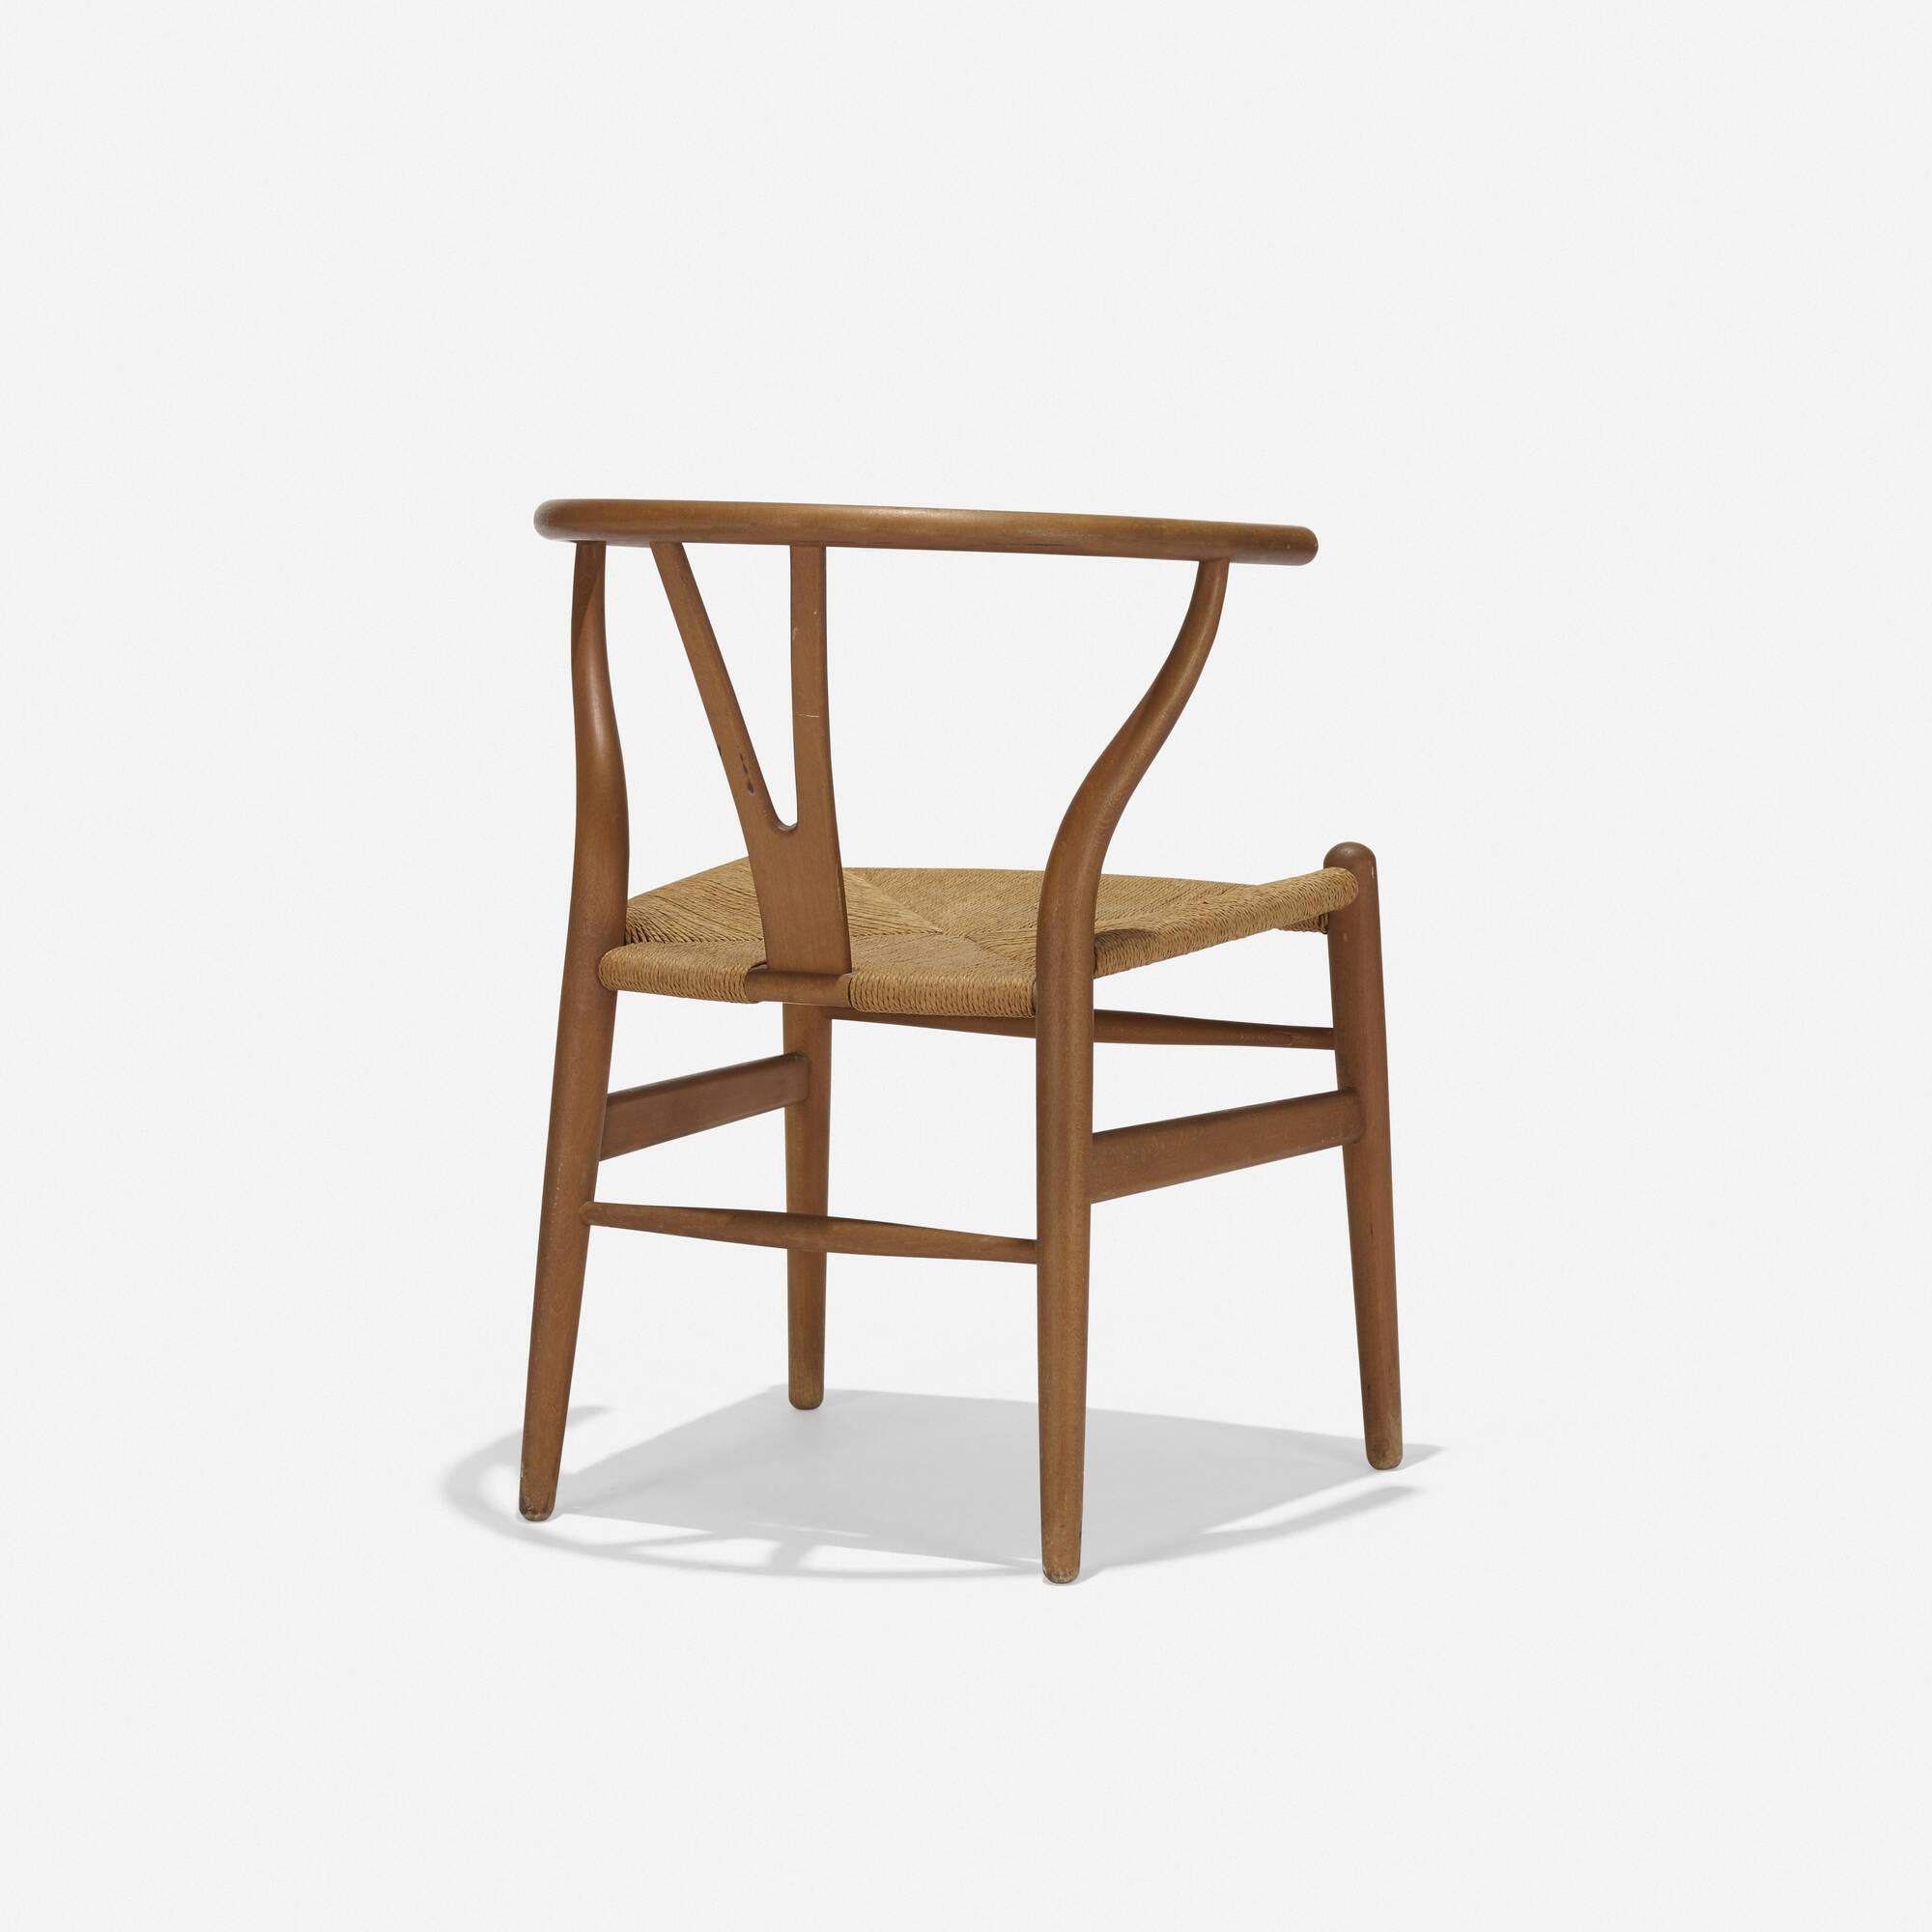 407 hans j wegner wishbone chair model ch24 2 of 3